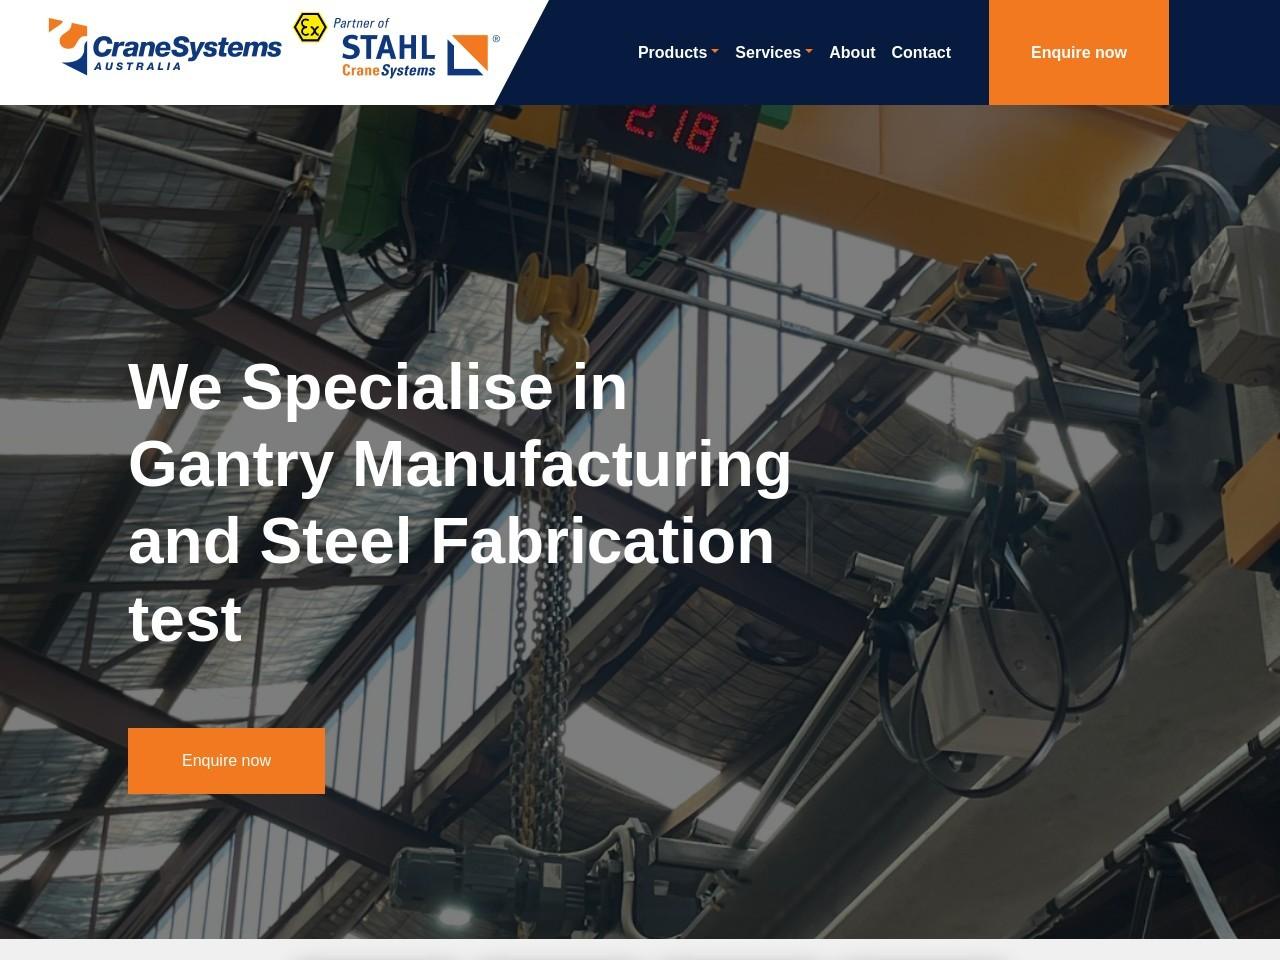 STAHL ST Chain Hoist – Crane Systems